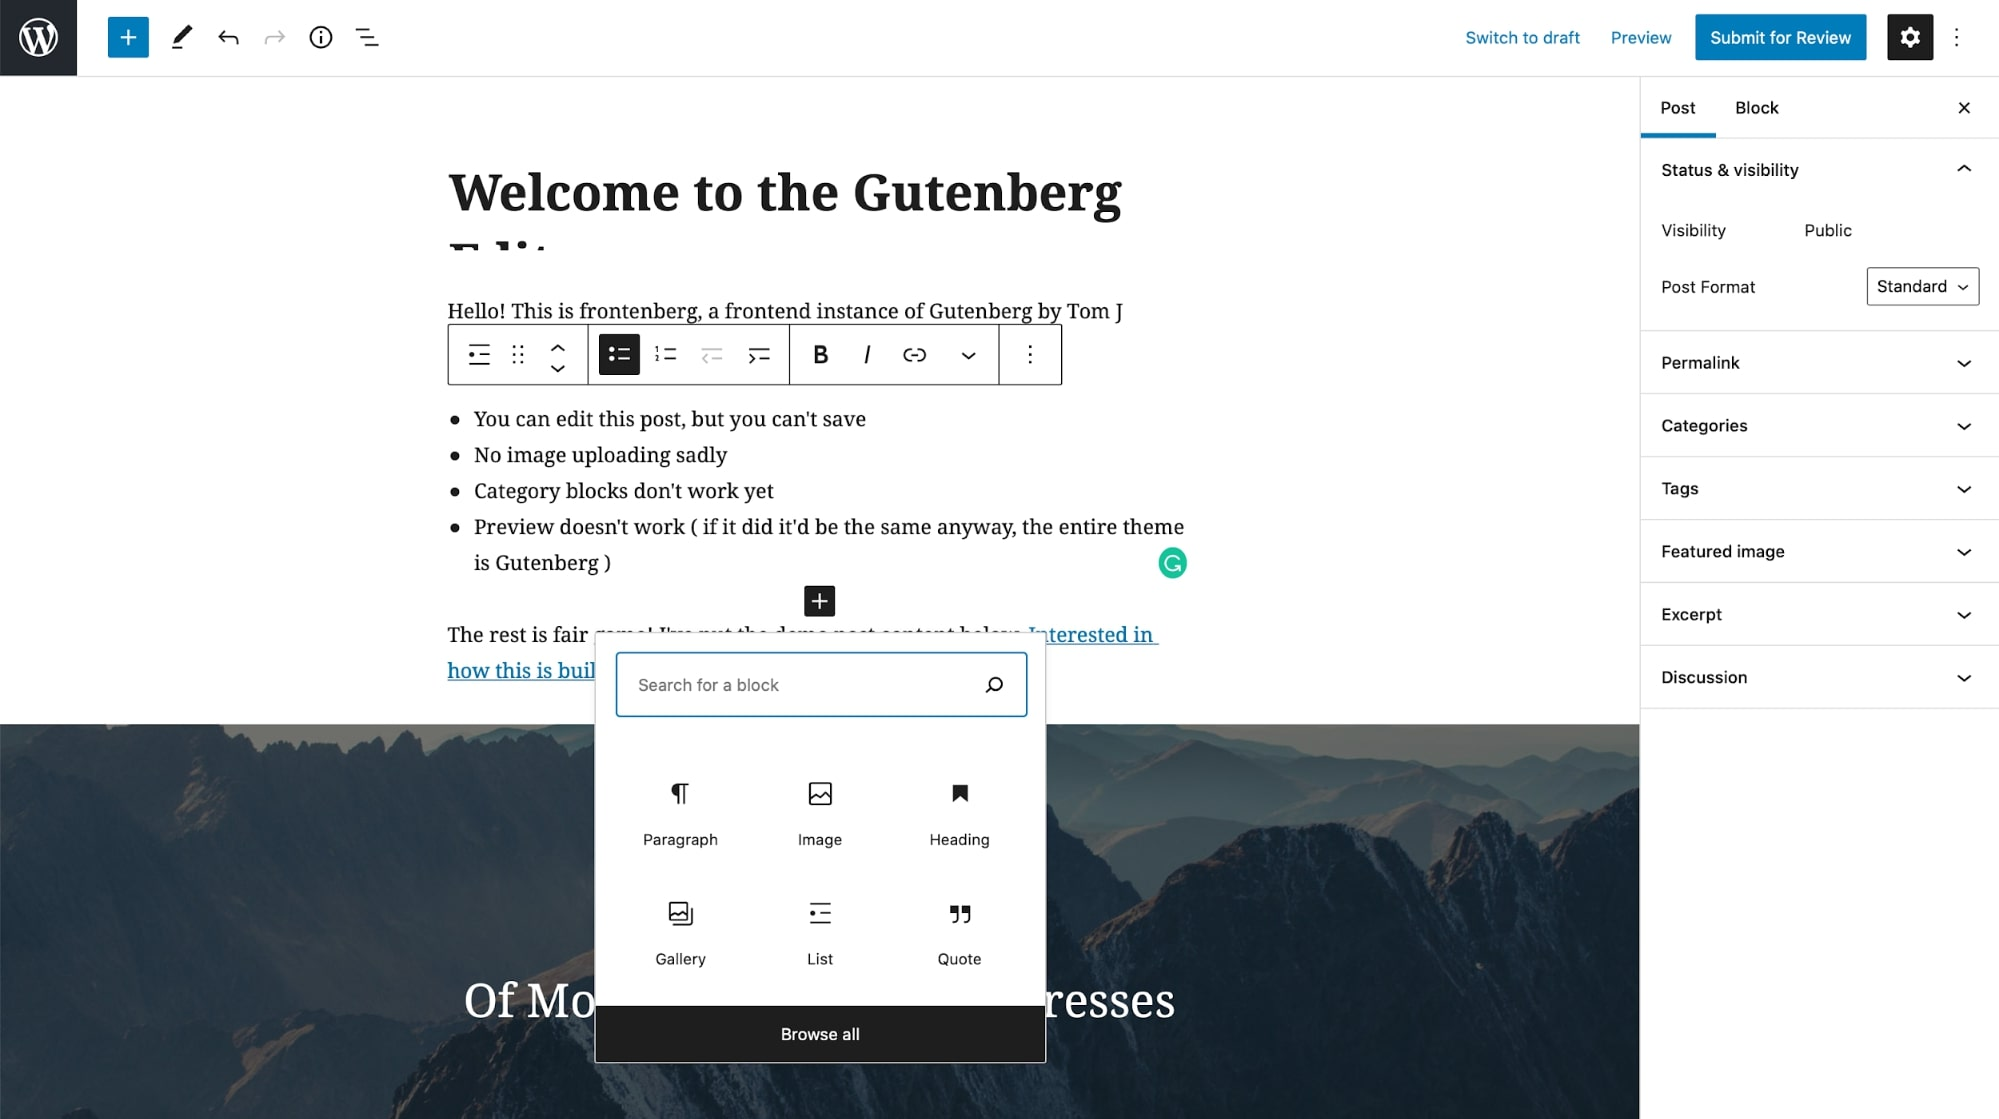 Gutenberg editor interface